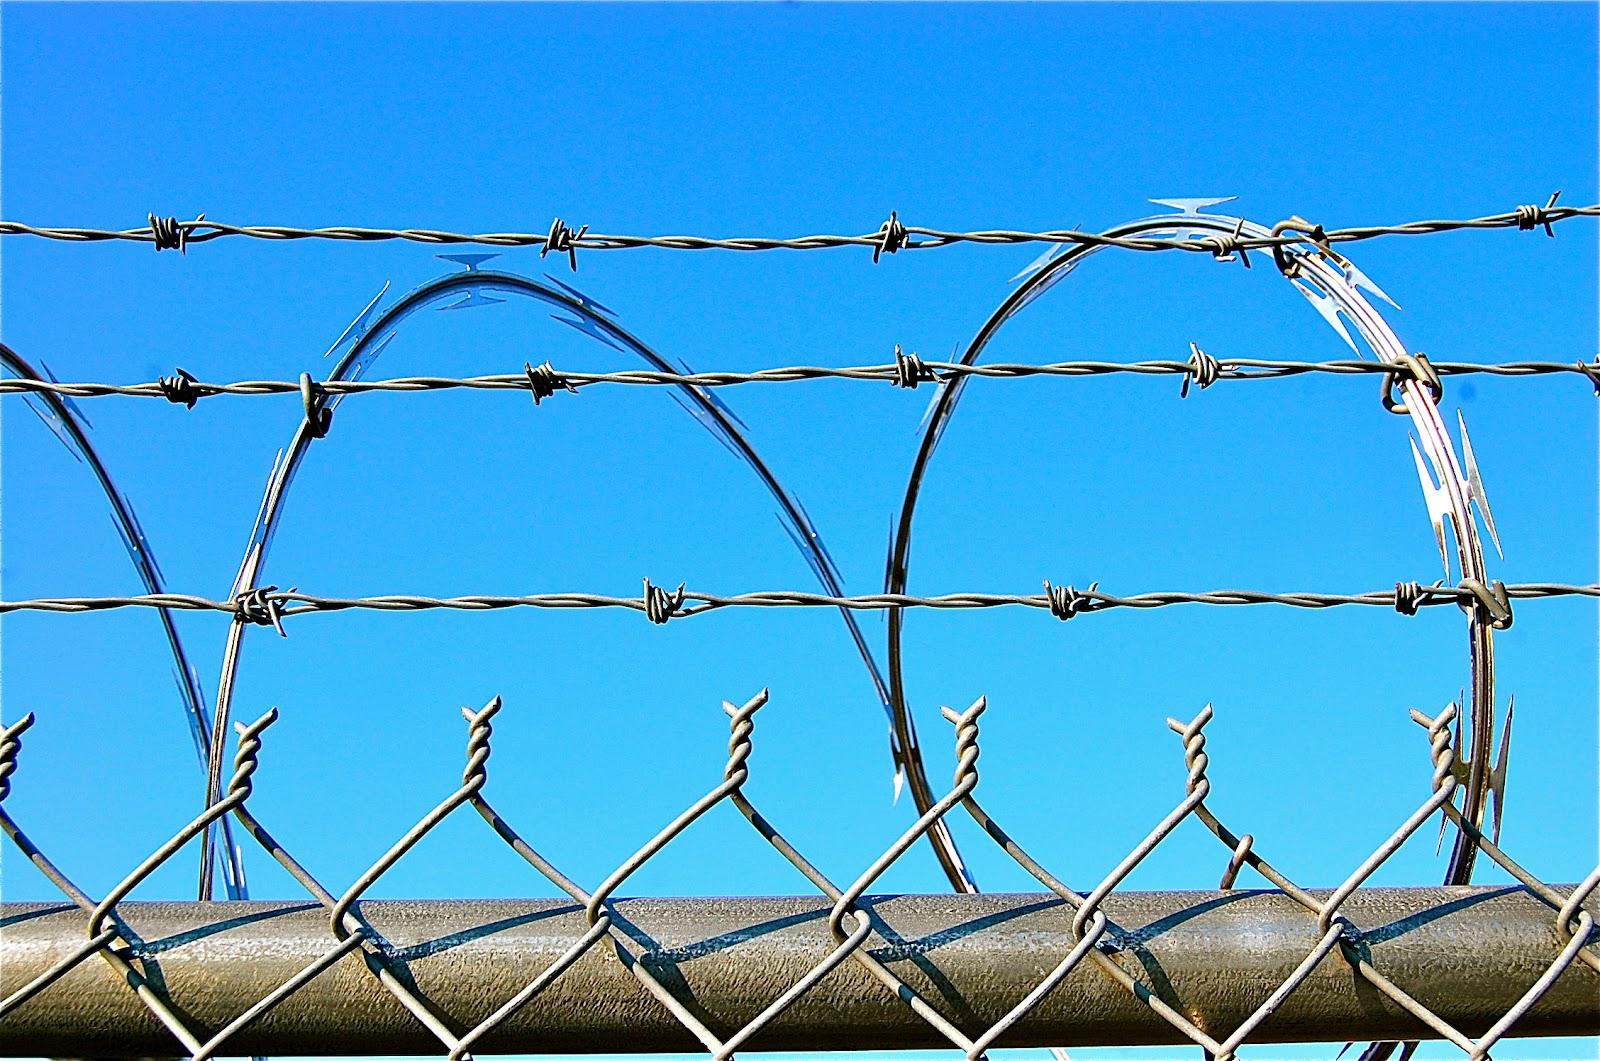 pORTcITYdAILYpHOTO: August 2012